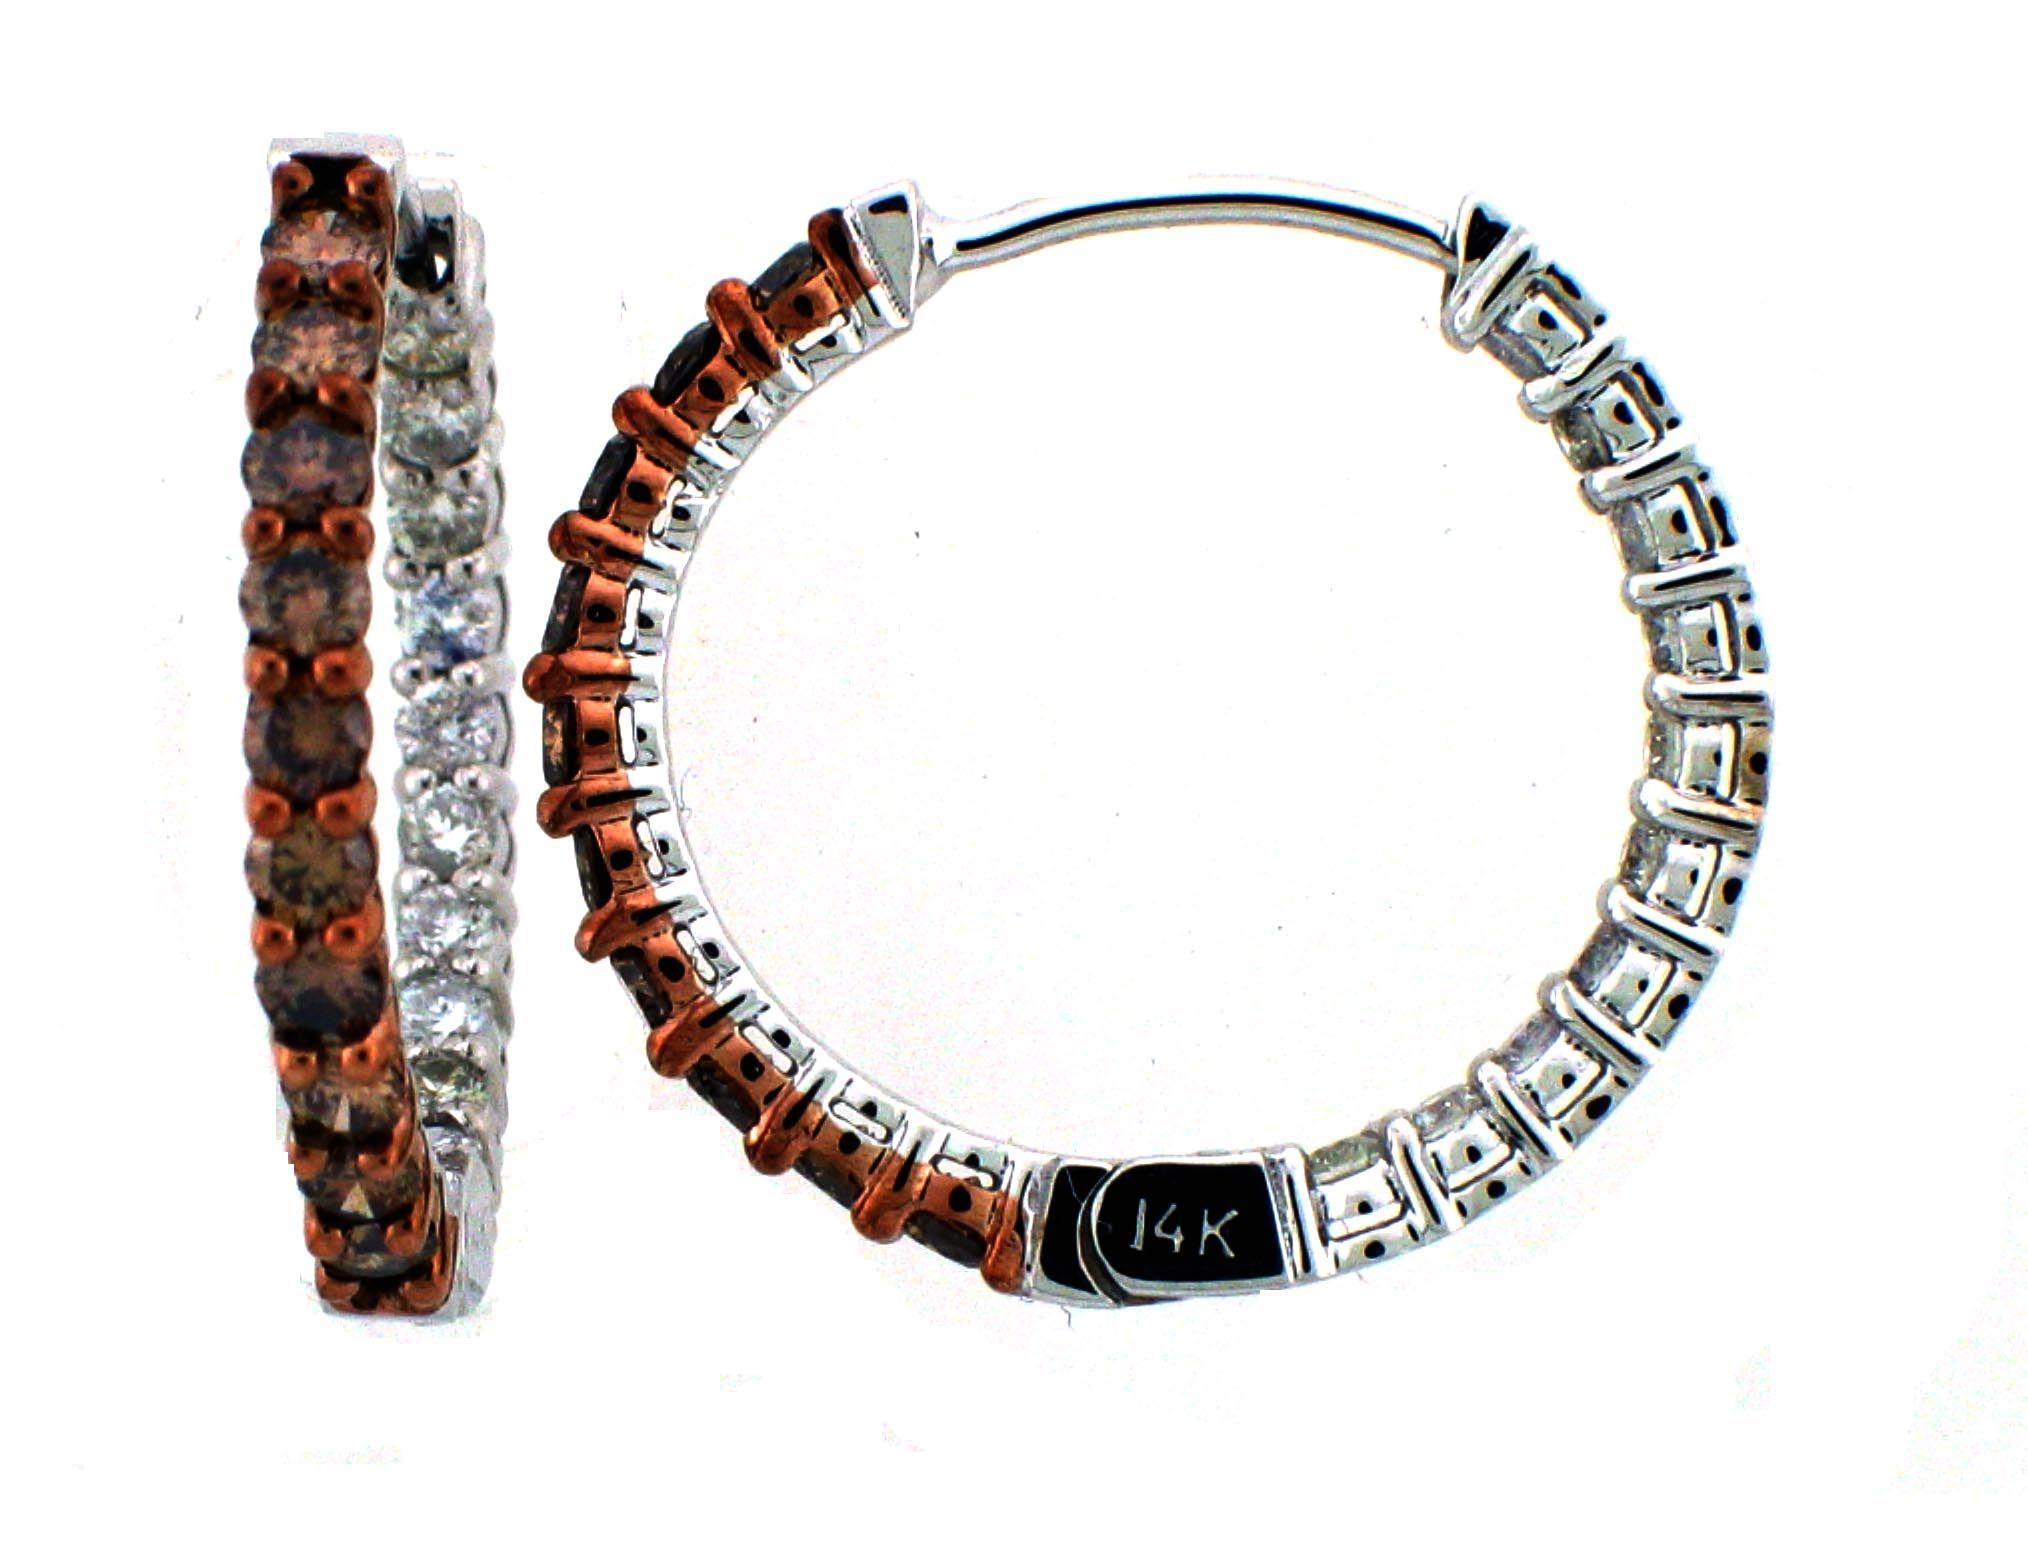 Chocolate Diamonds Jewelry  Earrings  Buy Chocolate Diamond Earrings  Online  Free Shipping